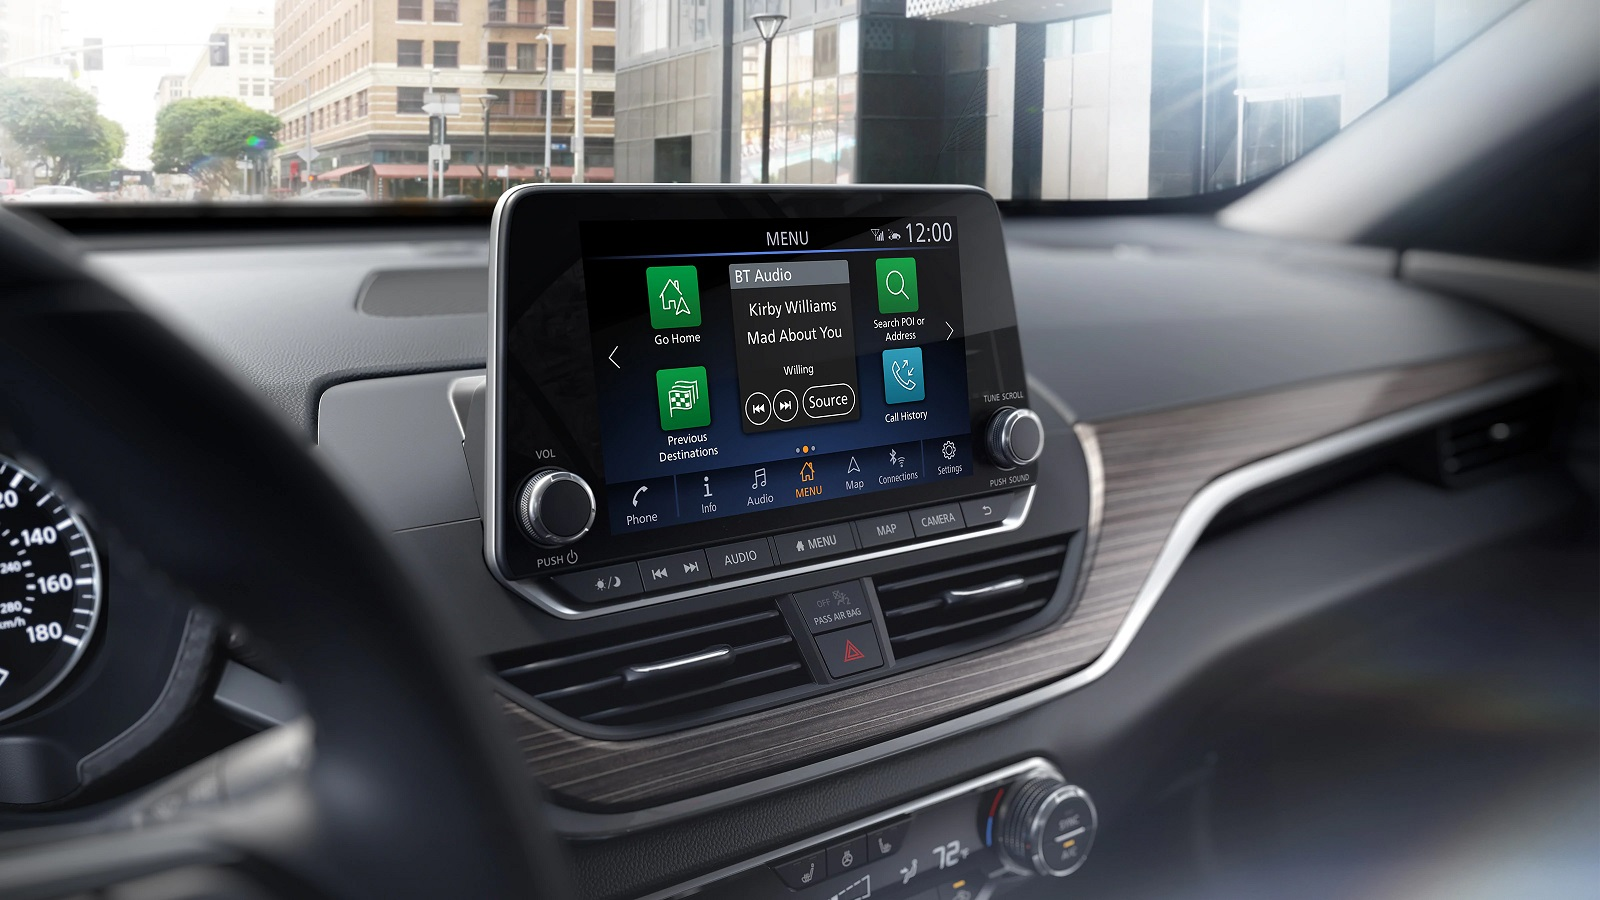 2020 Nissan Altima Dashboard